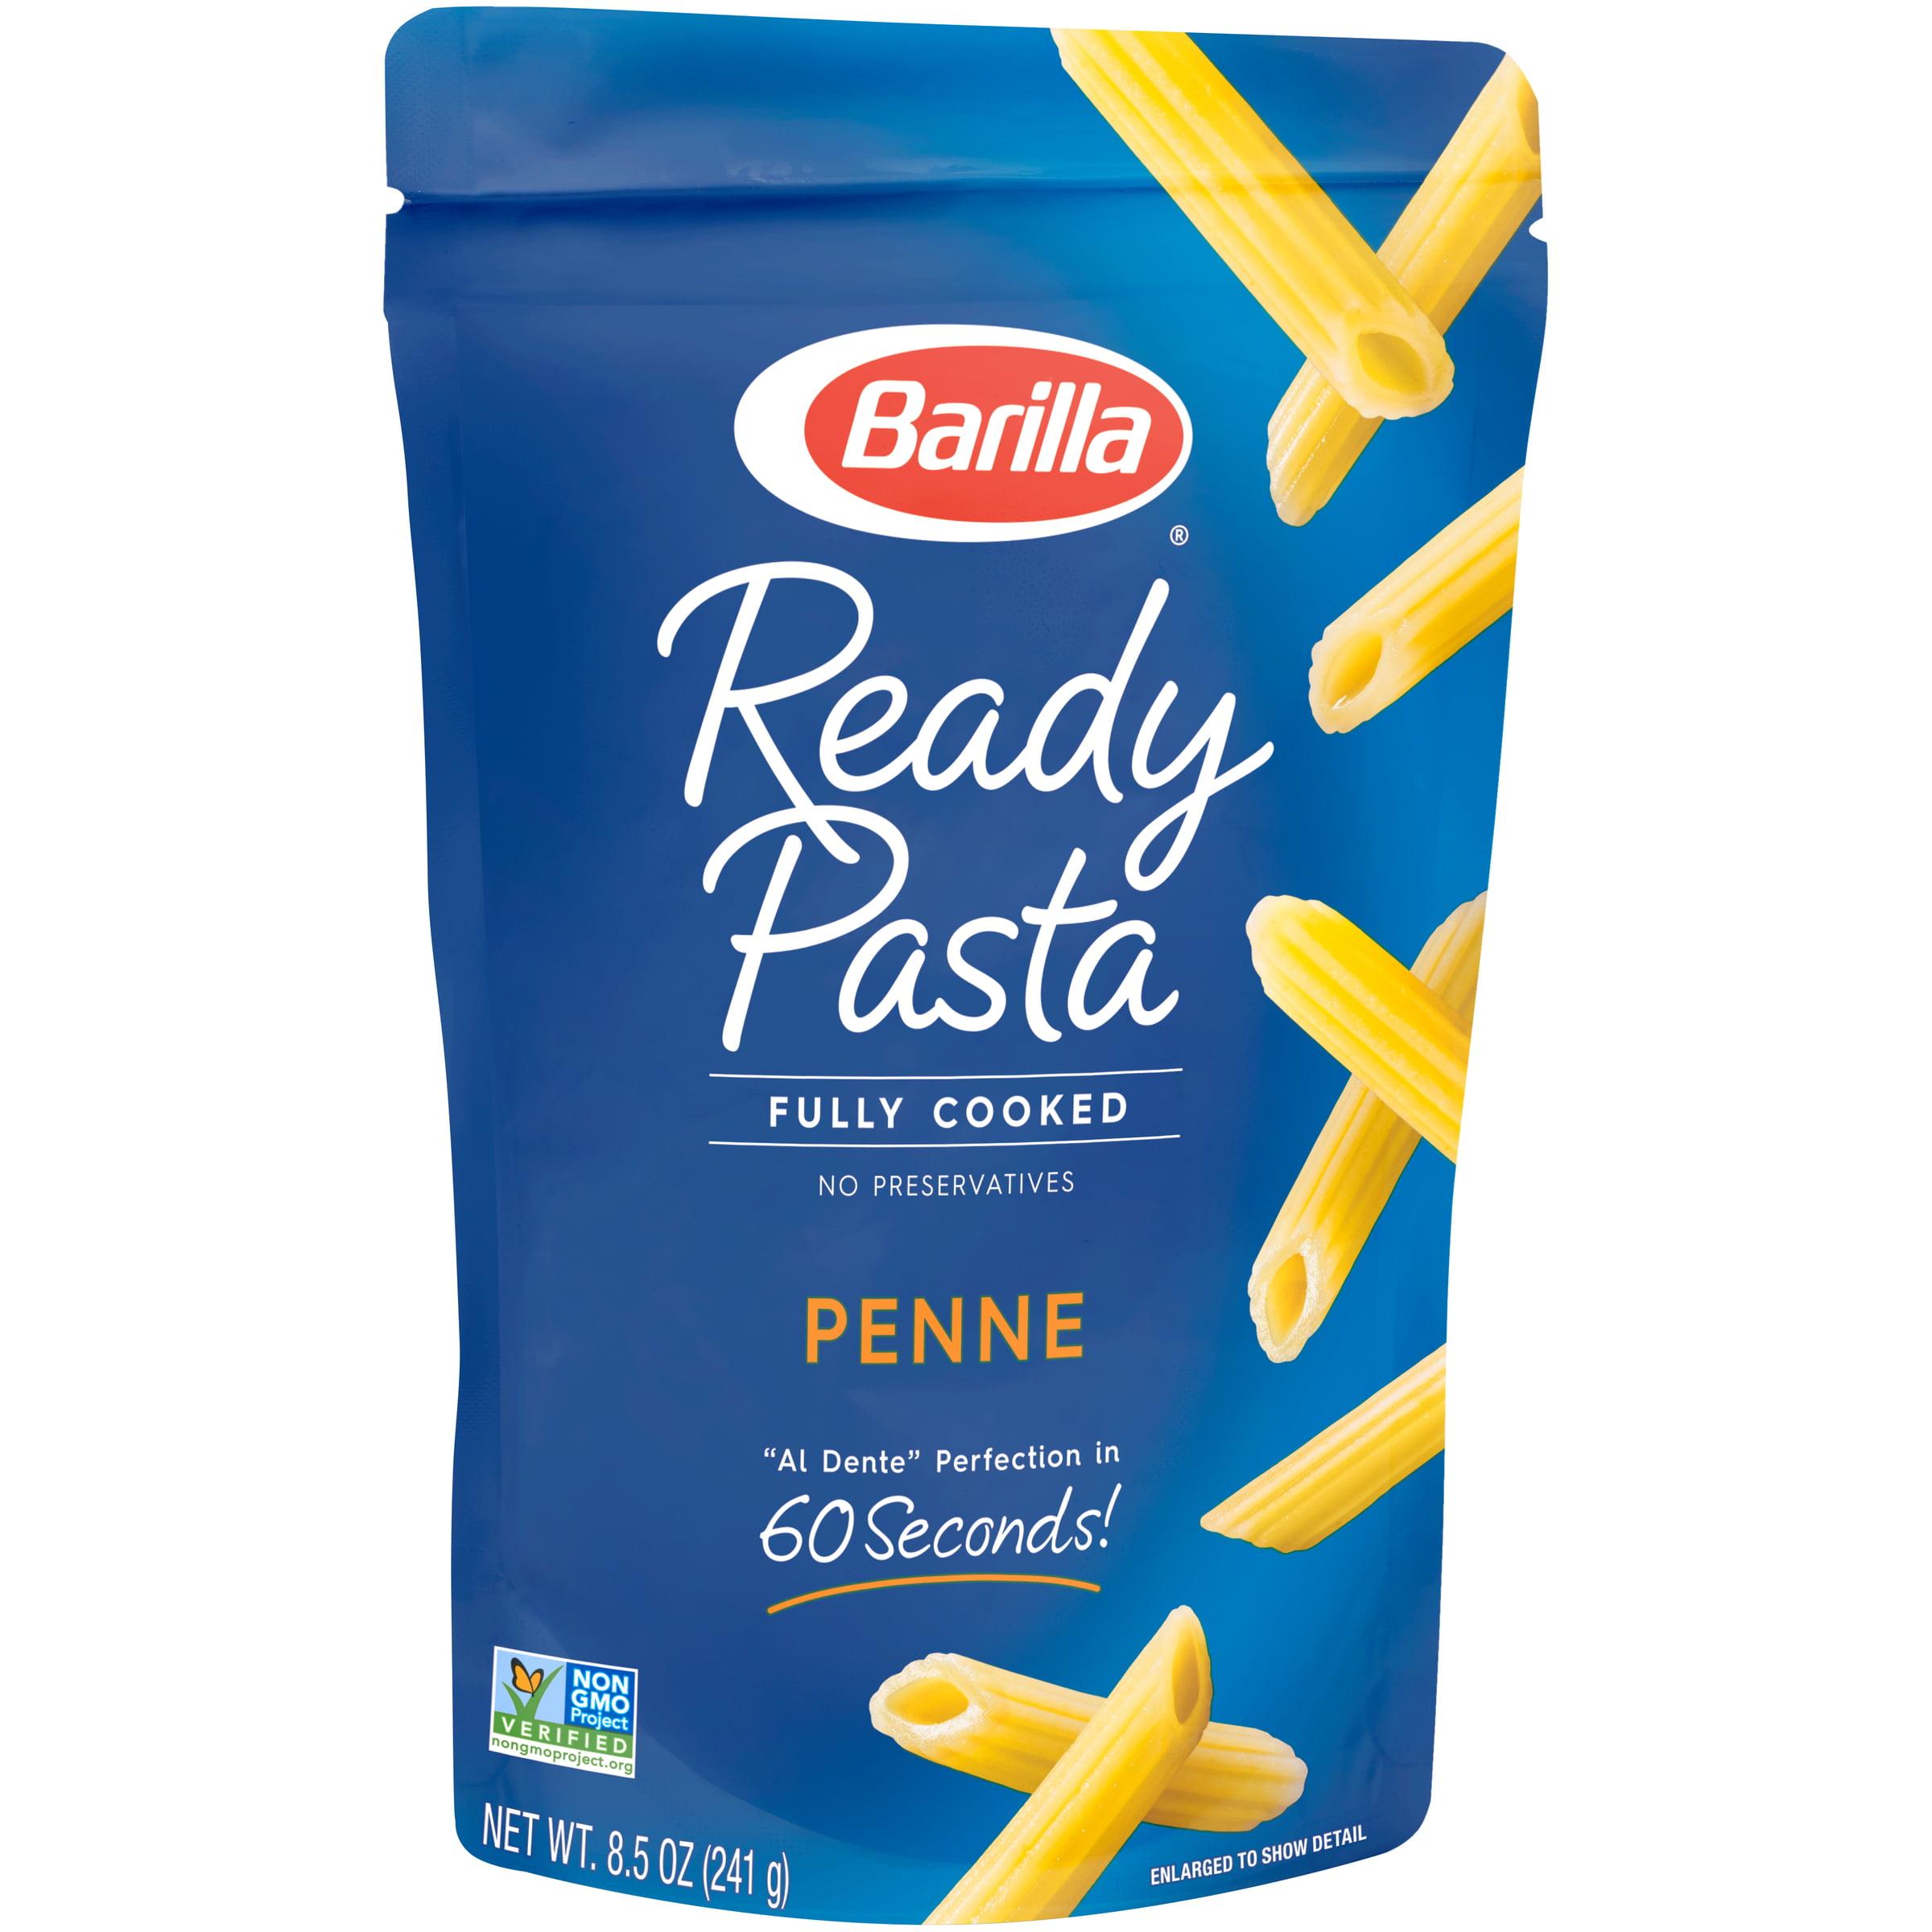 Barilla® Fully Coocked Ready Pasta Penne 8.5 oz